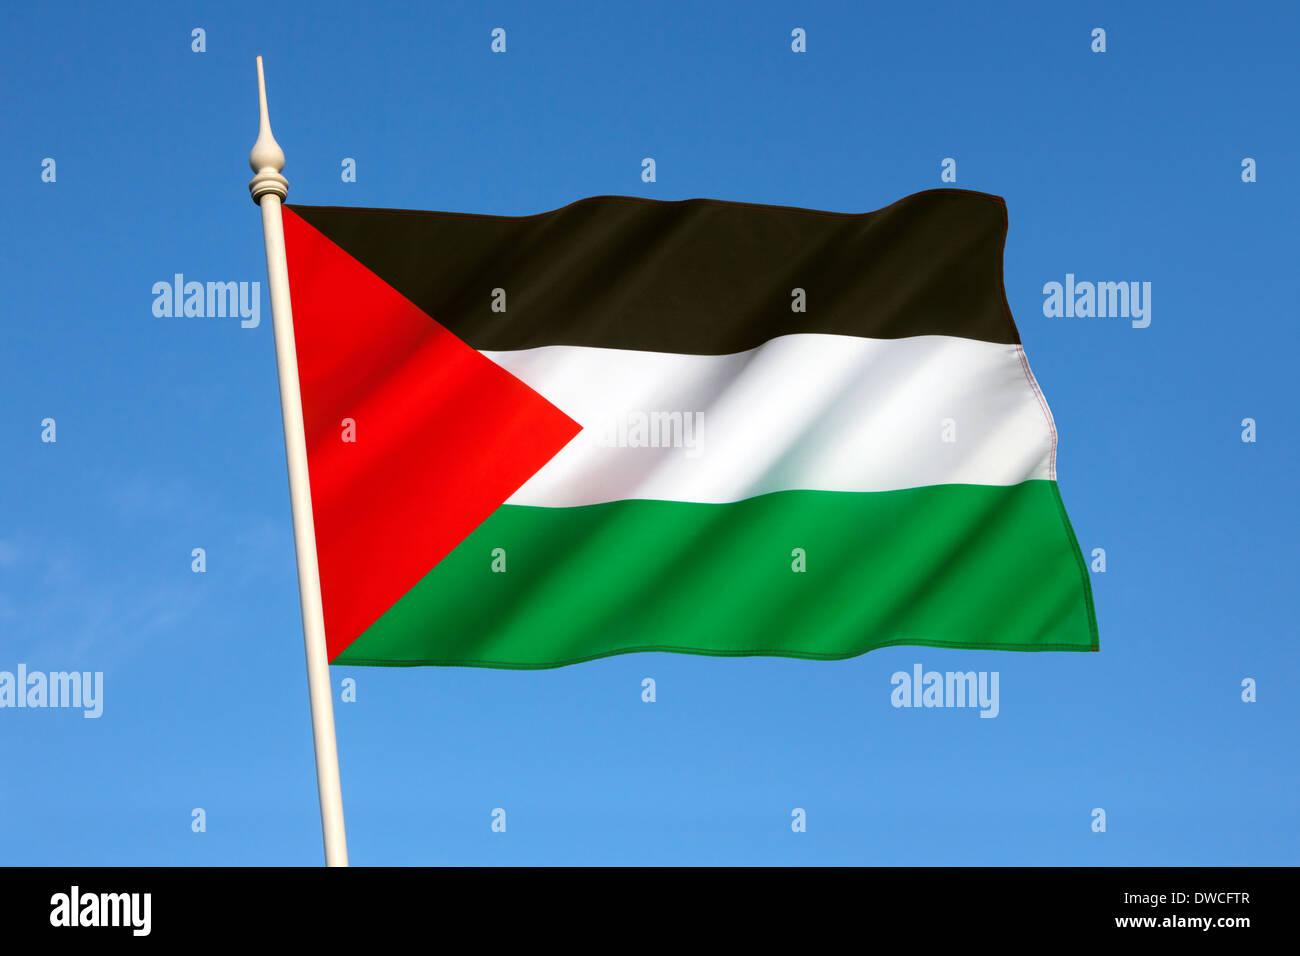 Flag of Palestine - Stock Image